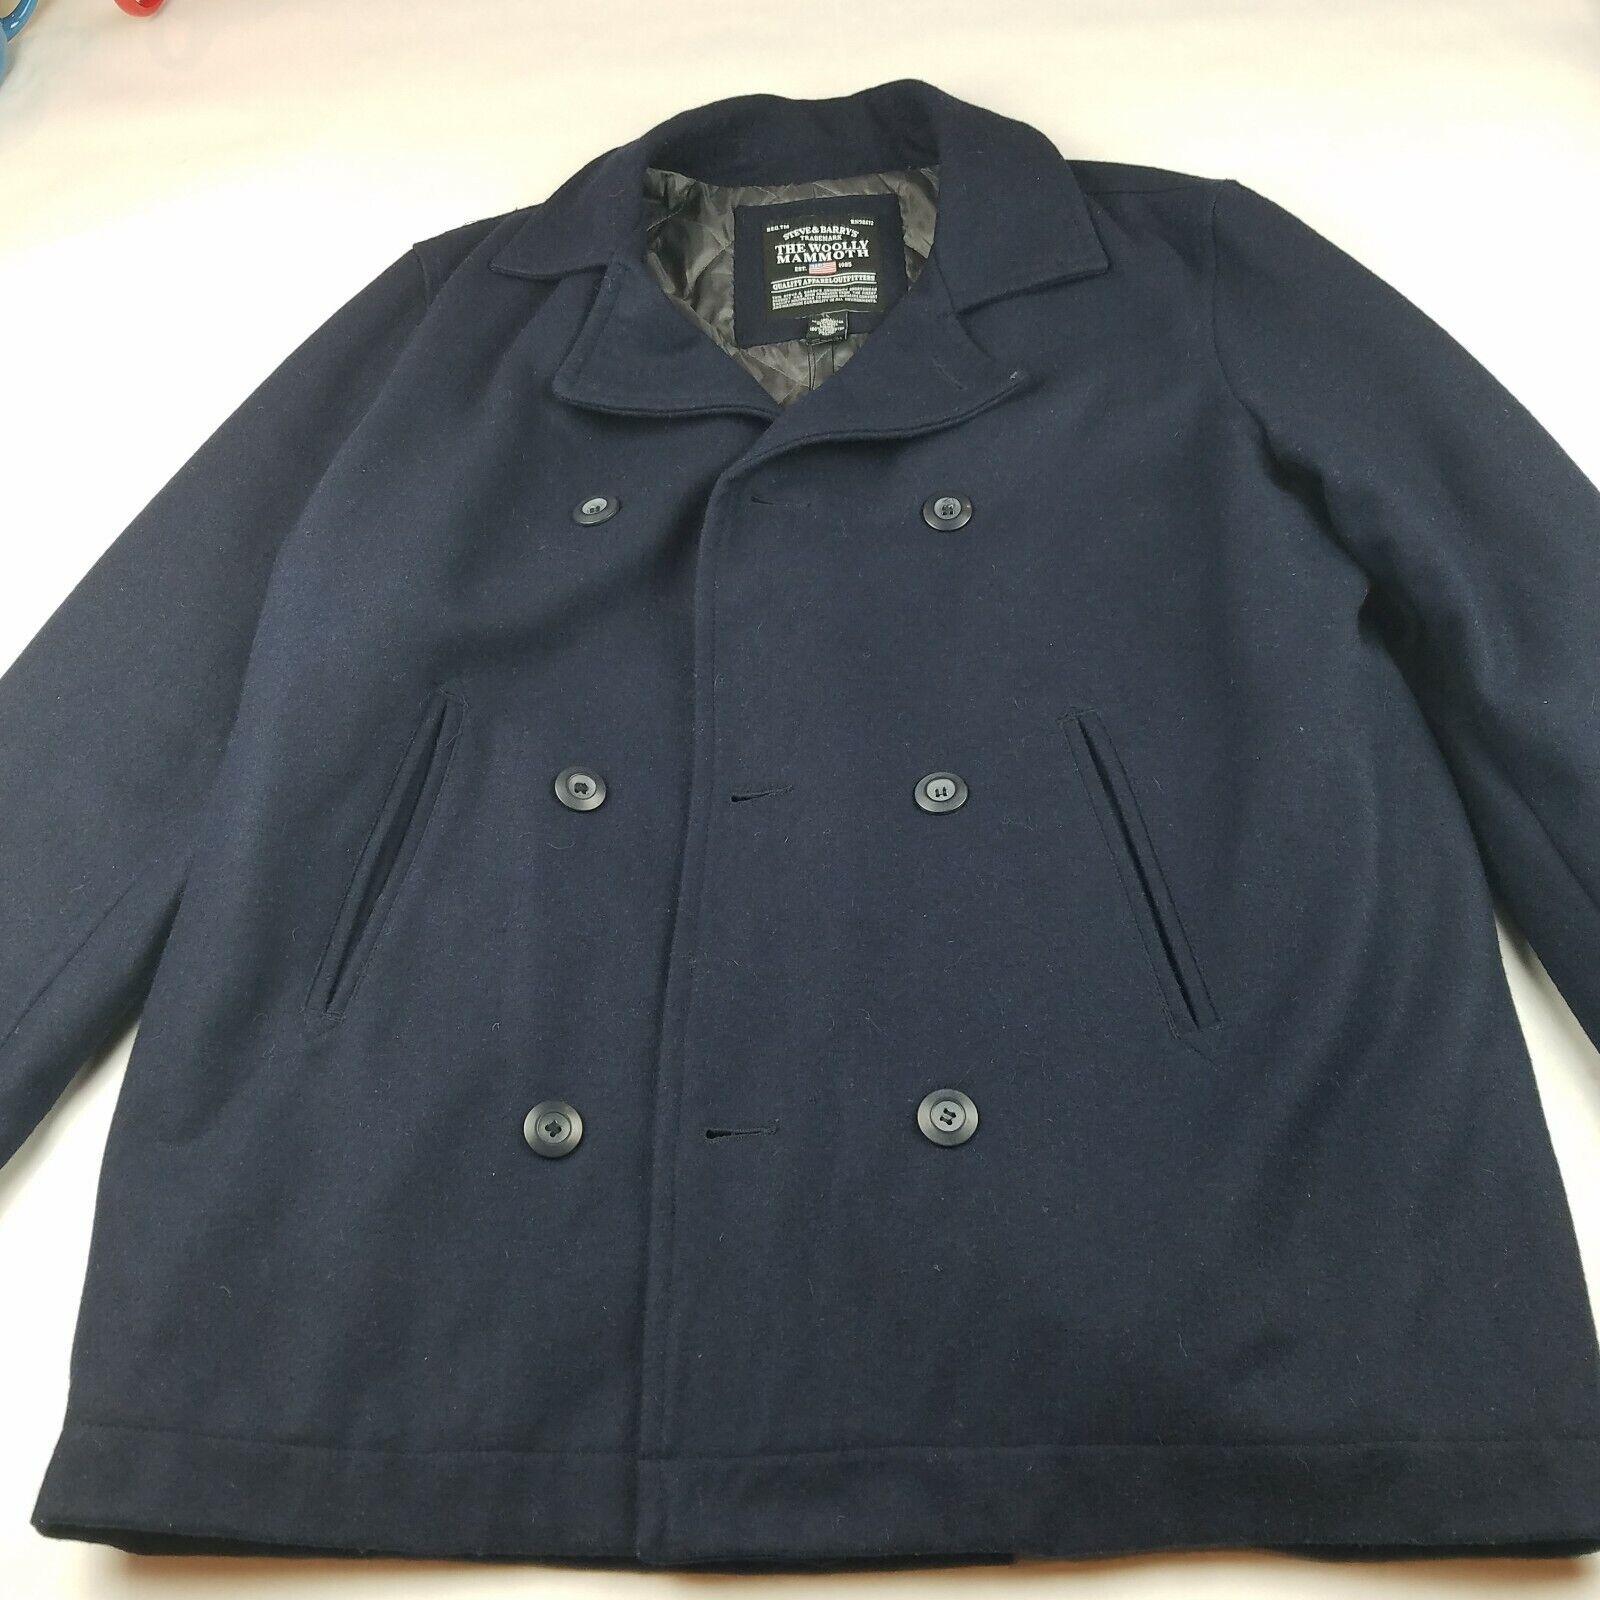 Para hombre Steve  & Barry& 039;s el lanudo mamut Doble Abotonadura PEA Coat Azul Marino Talla L  compra limitada